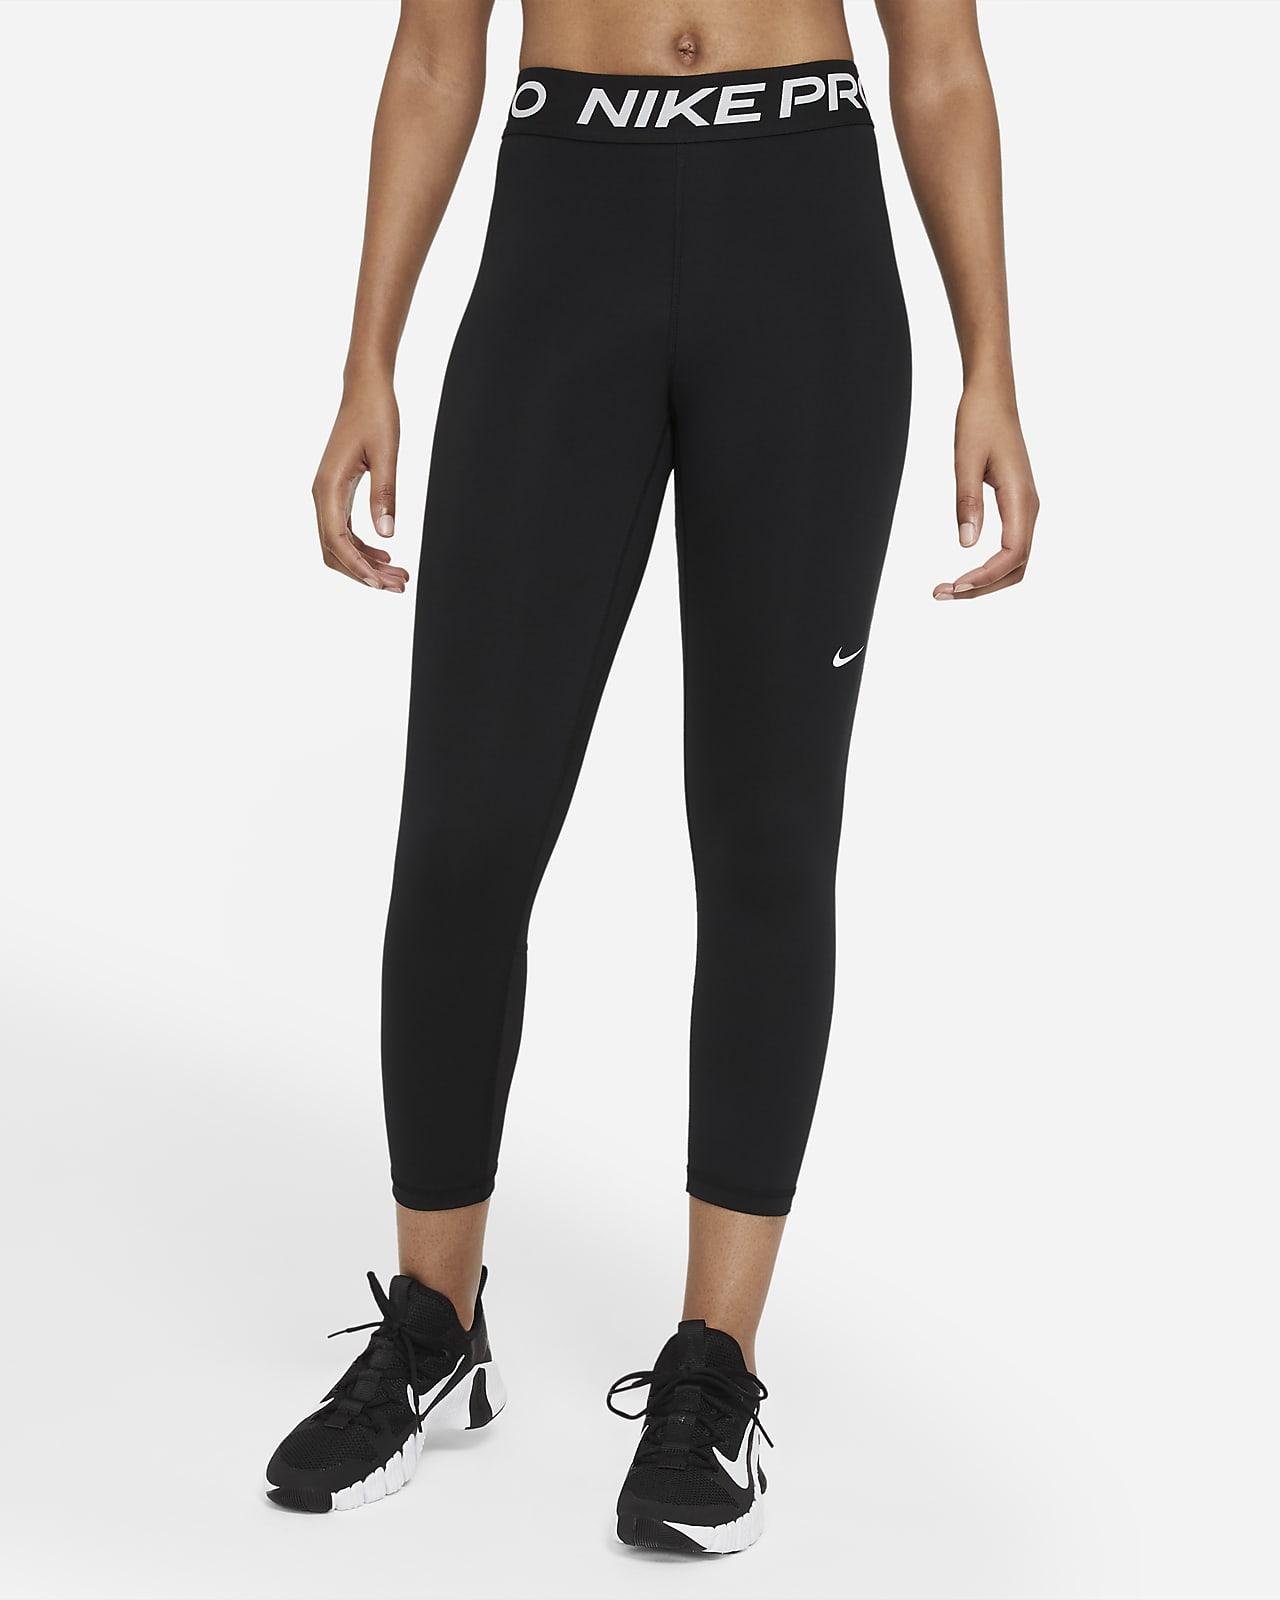 Korte Nike Pro 365-leggings med mellemhøj talje til kvinder